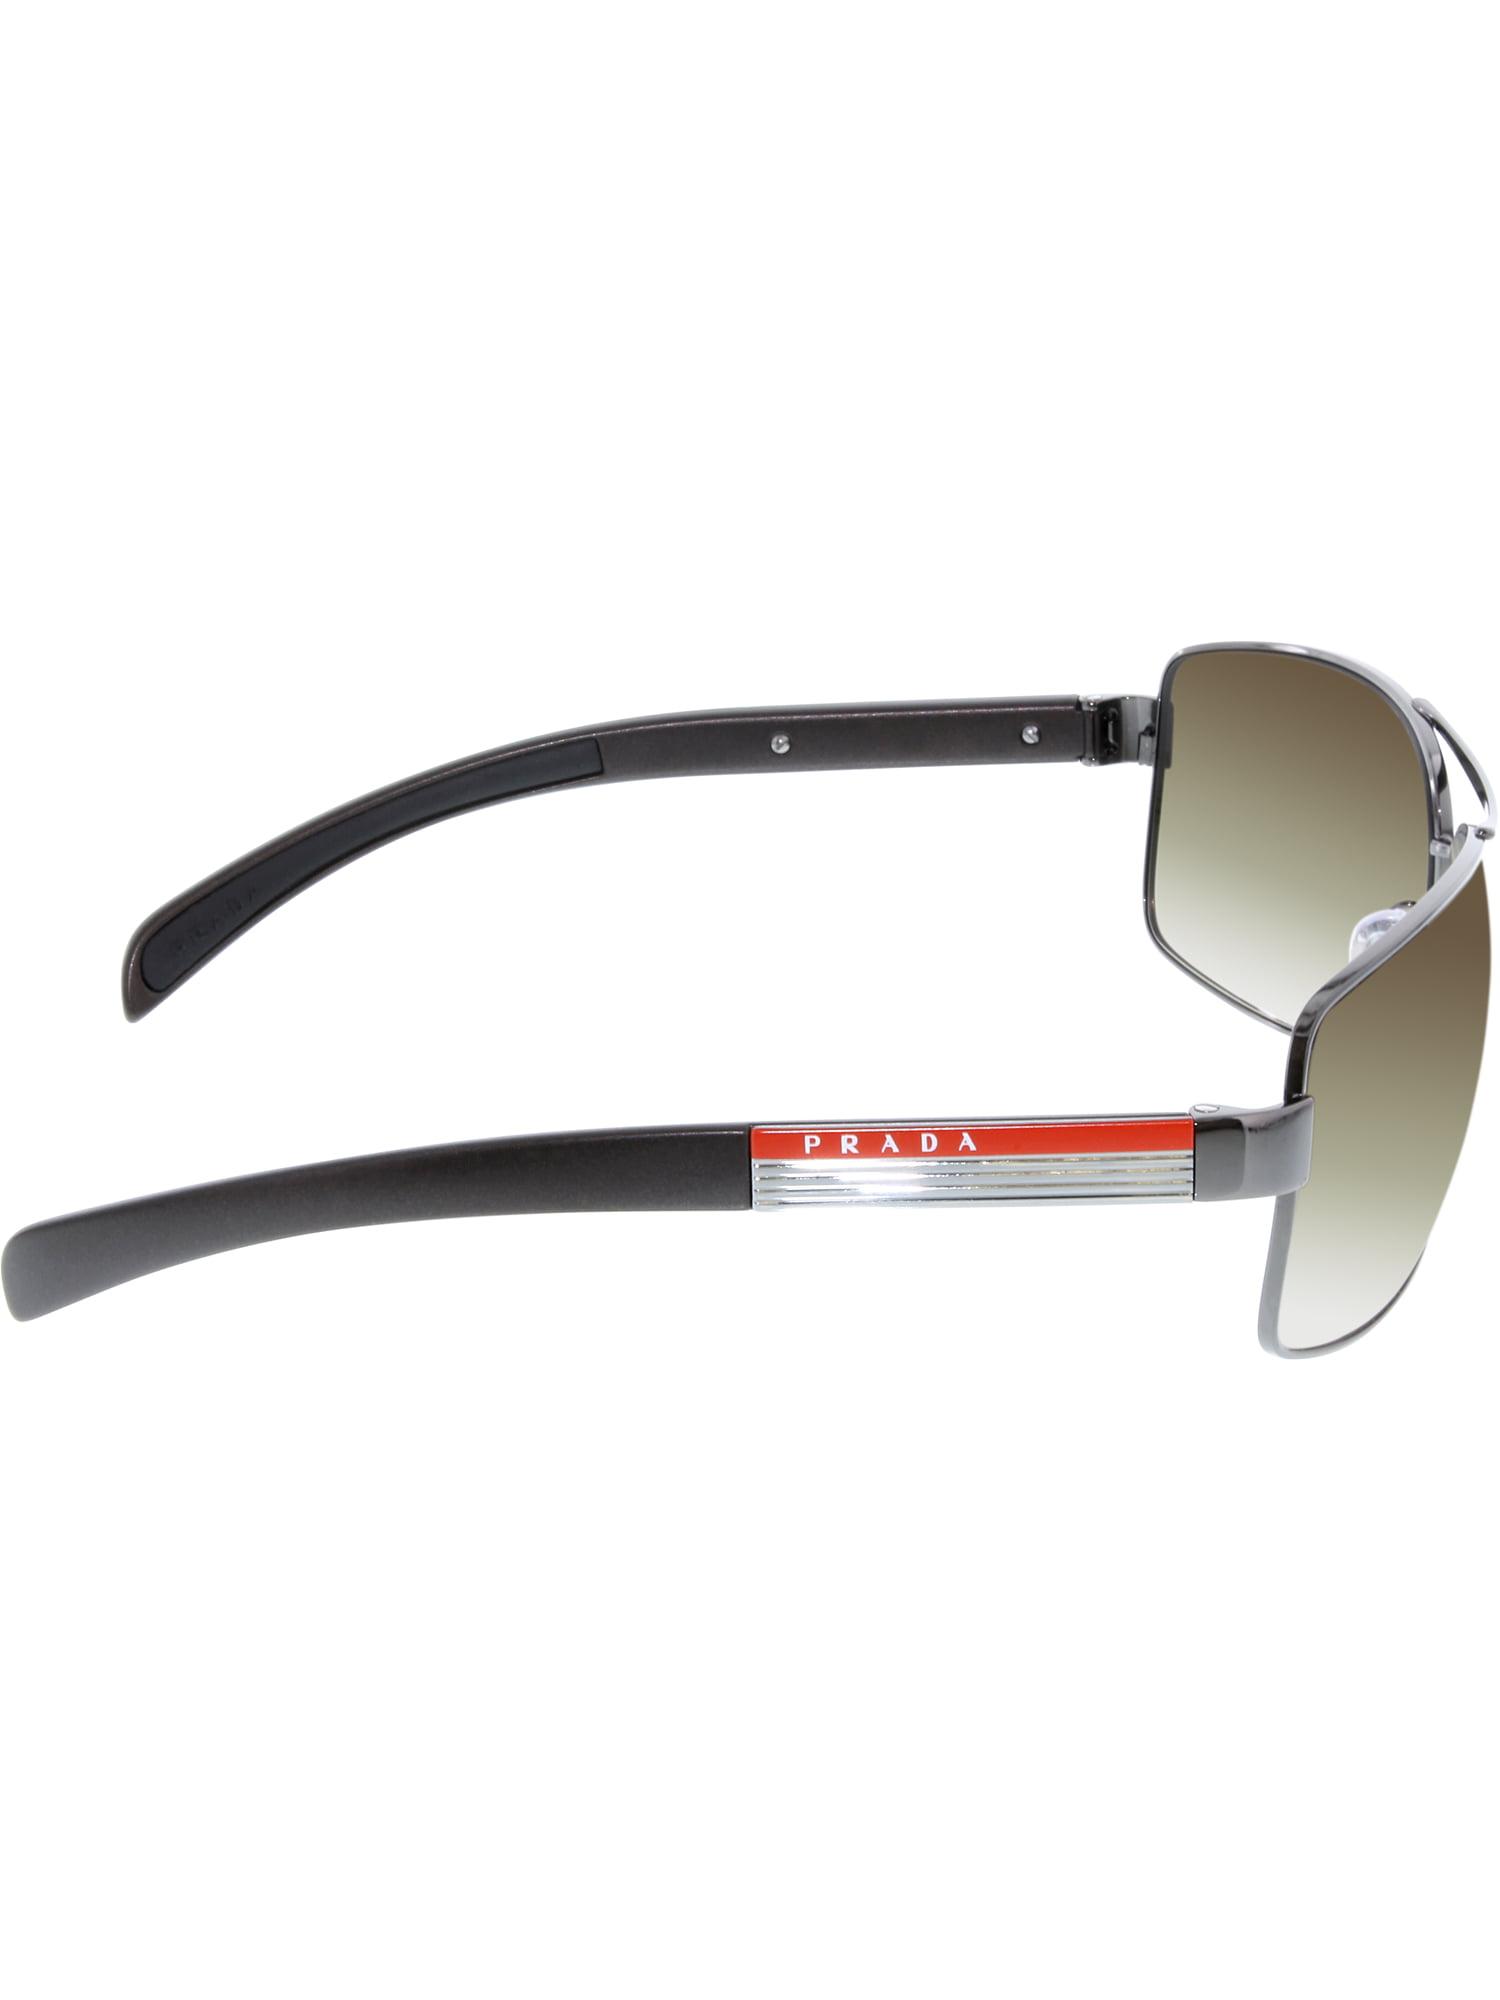 b38428b661c Prada - Prada Men s Gradient PS54IS-1BC3M1-65 Silver Rectangle Sunglasses -  Walmart.com